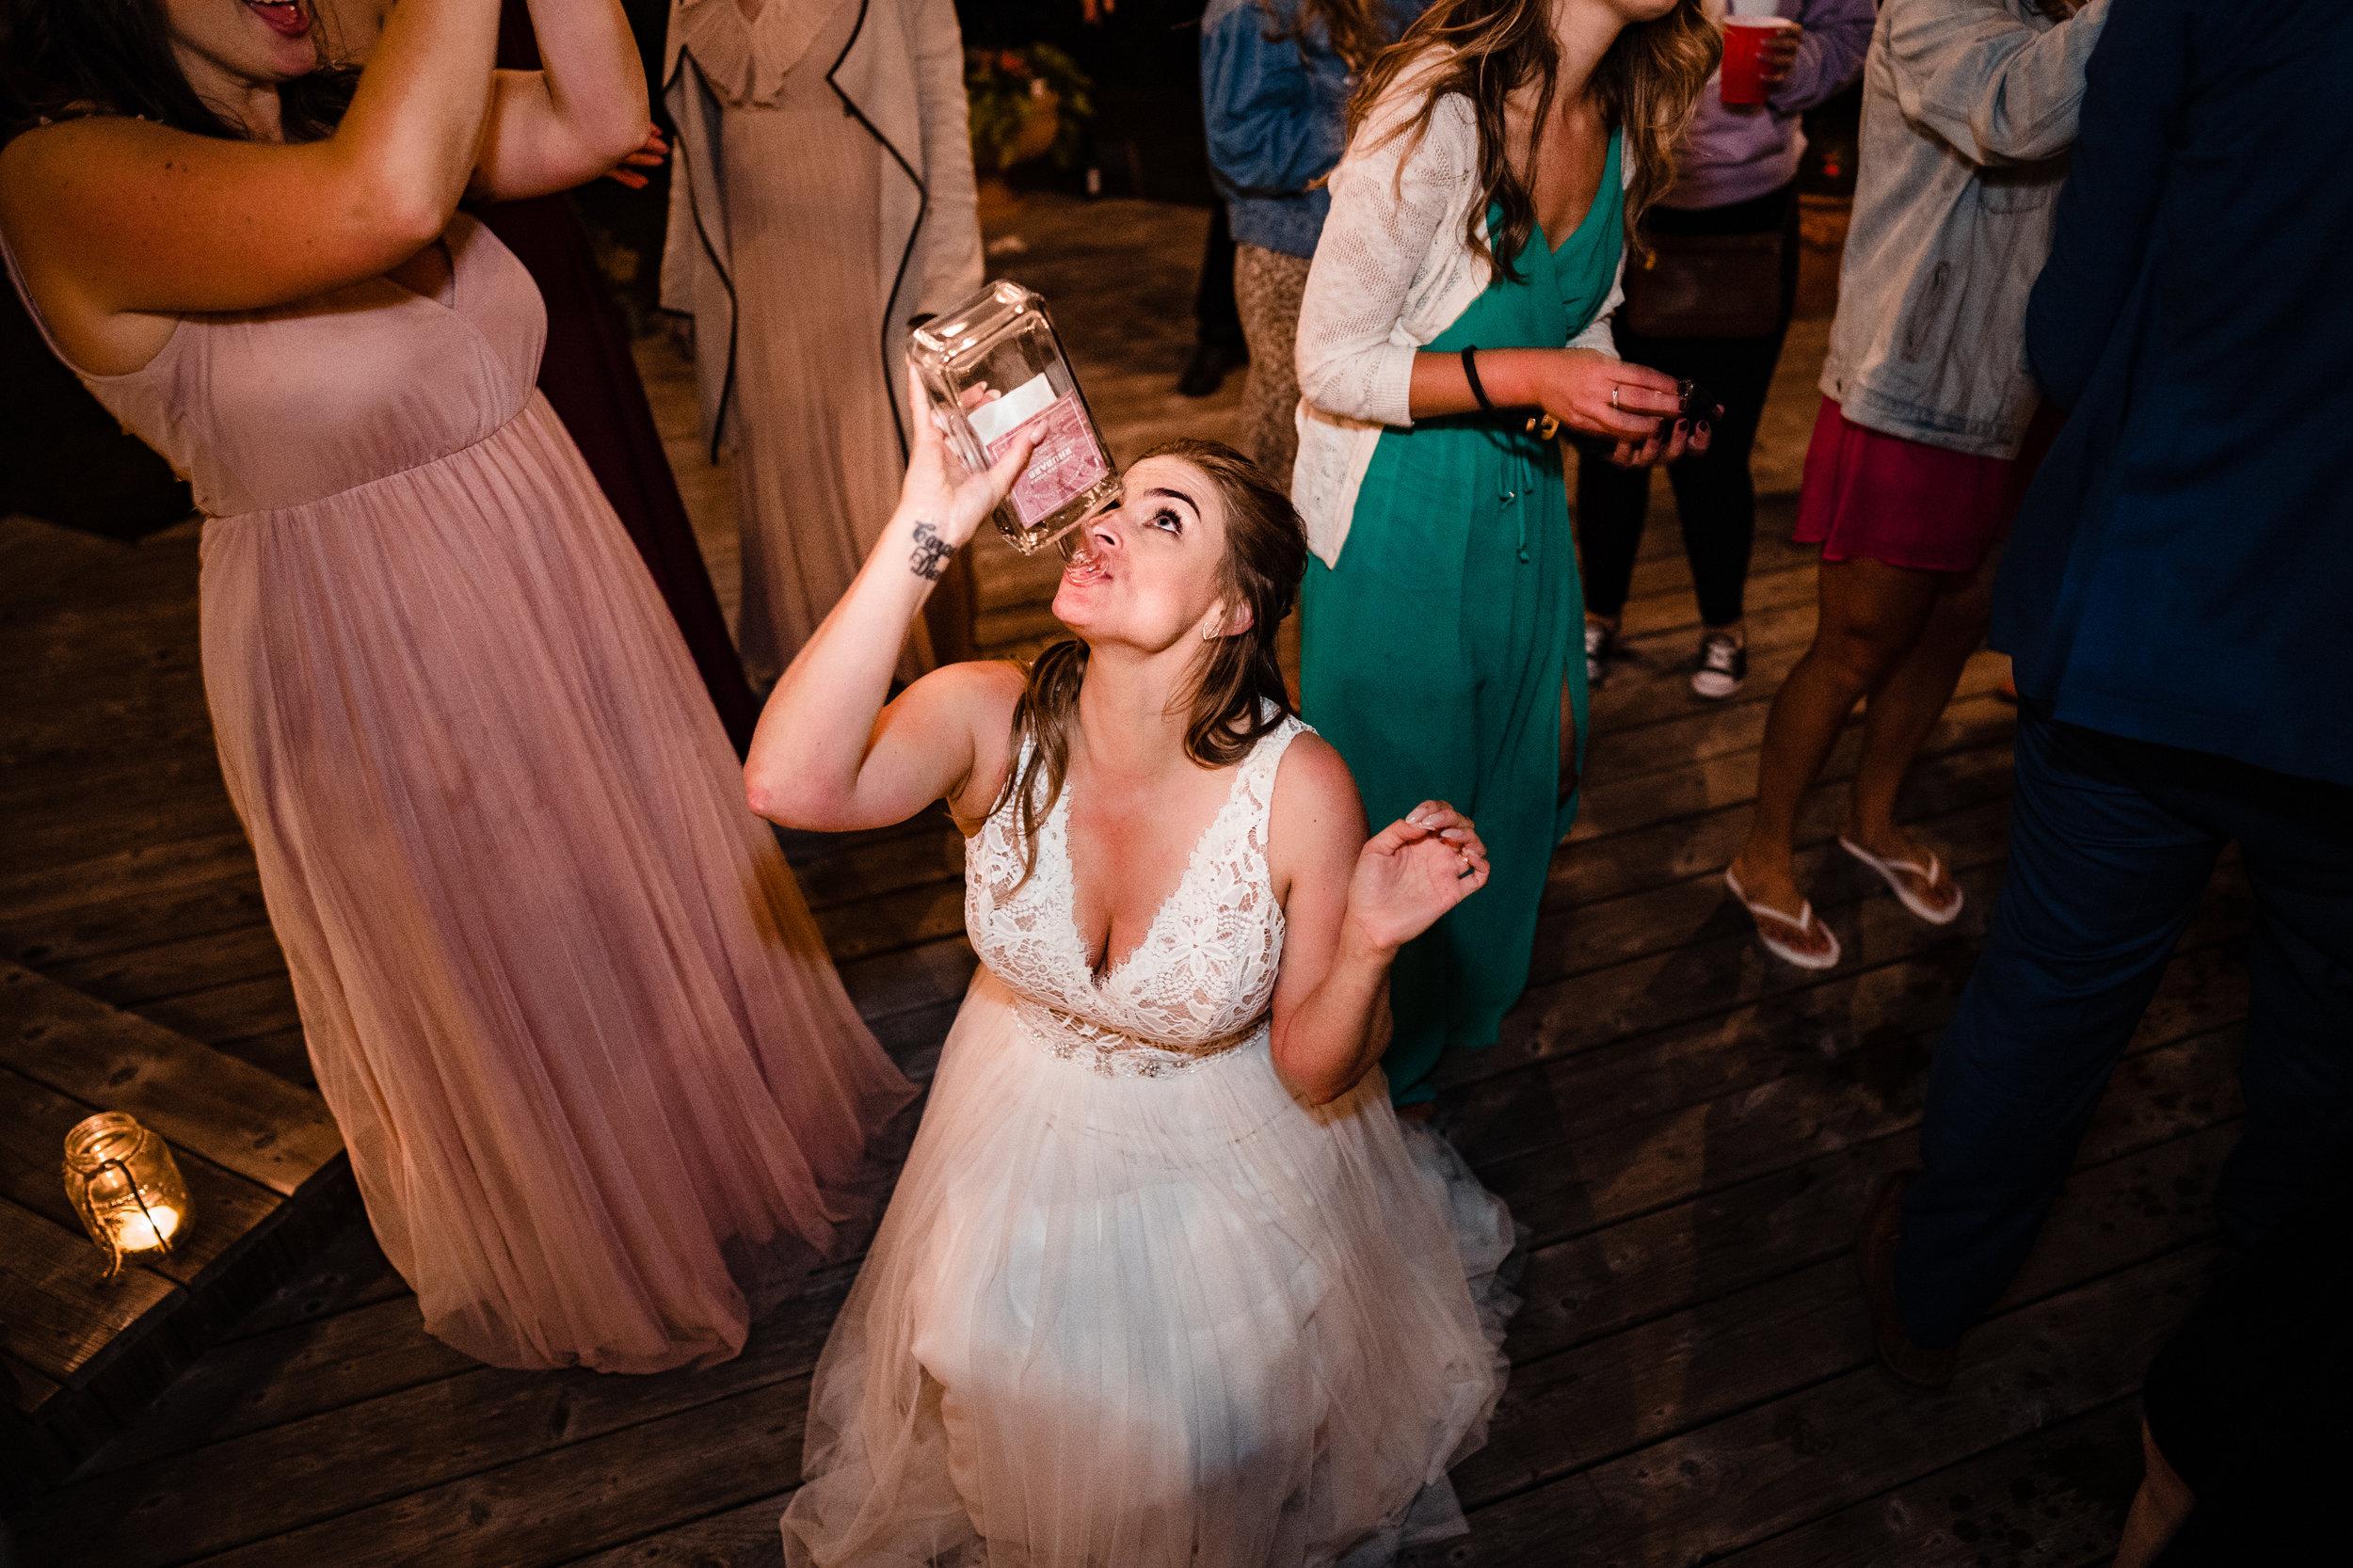 Janelle-Mitch-Halifax-Wedding-Nova-Scotia-Photography (158 of 163).jpg